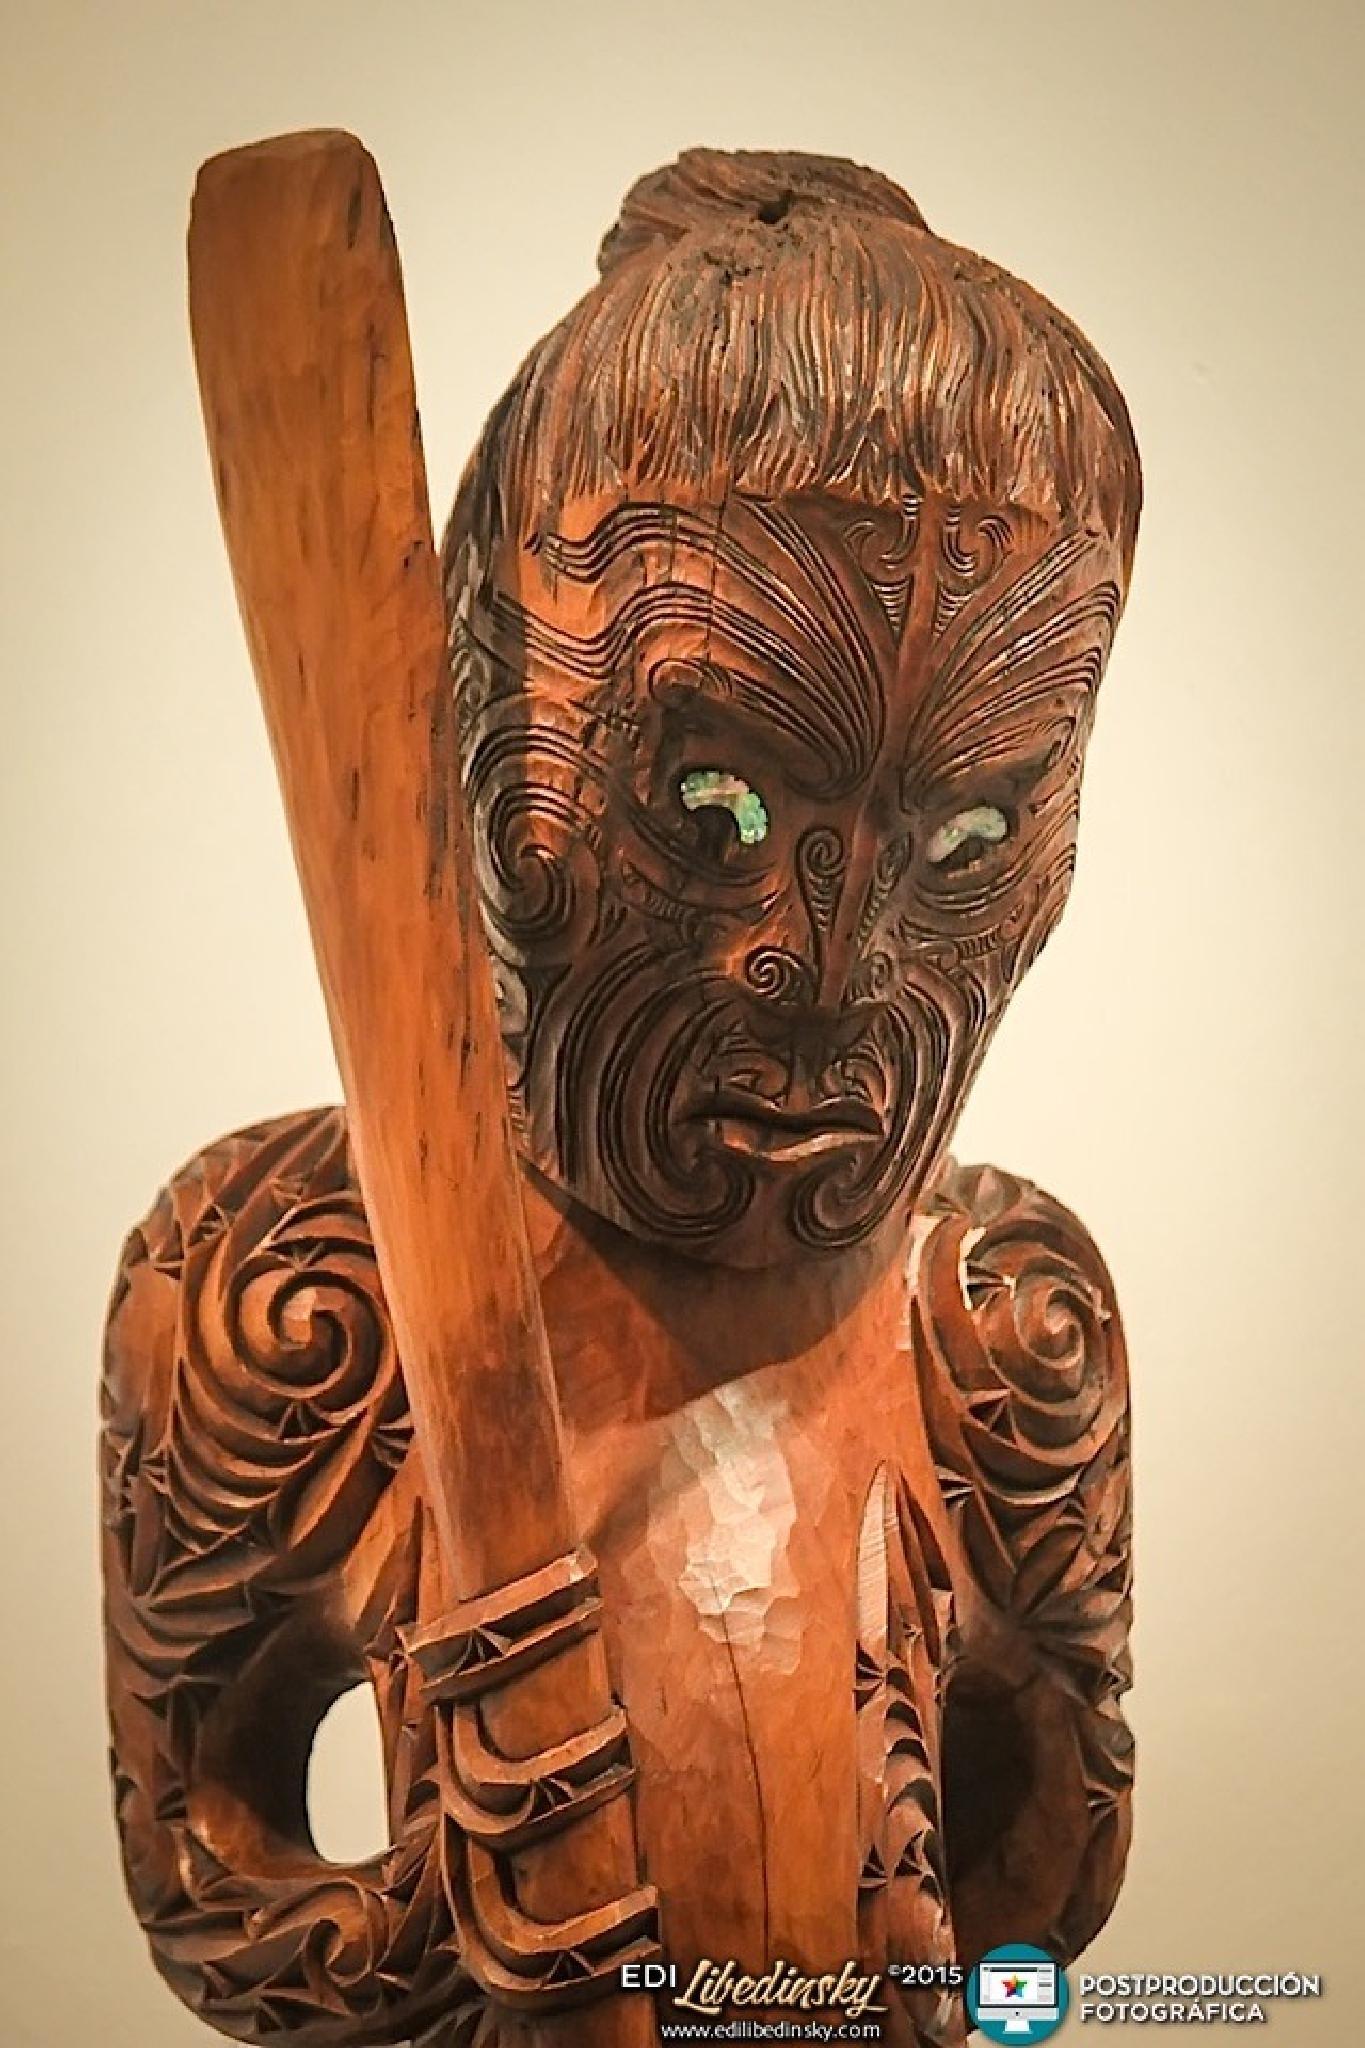 Arte Maorí en la Usina del Arte - 2015 © Edi Libedinsky by Edi Libedinsky